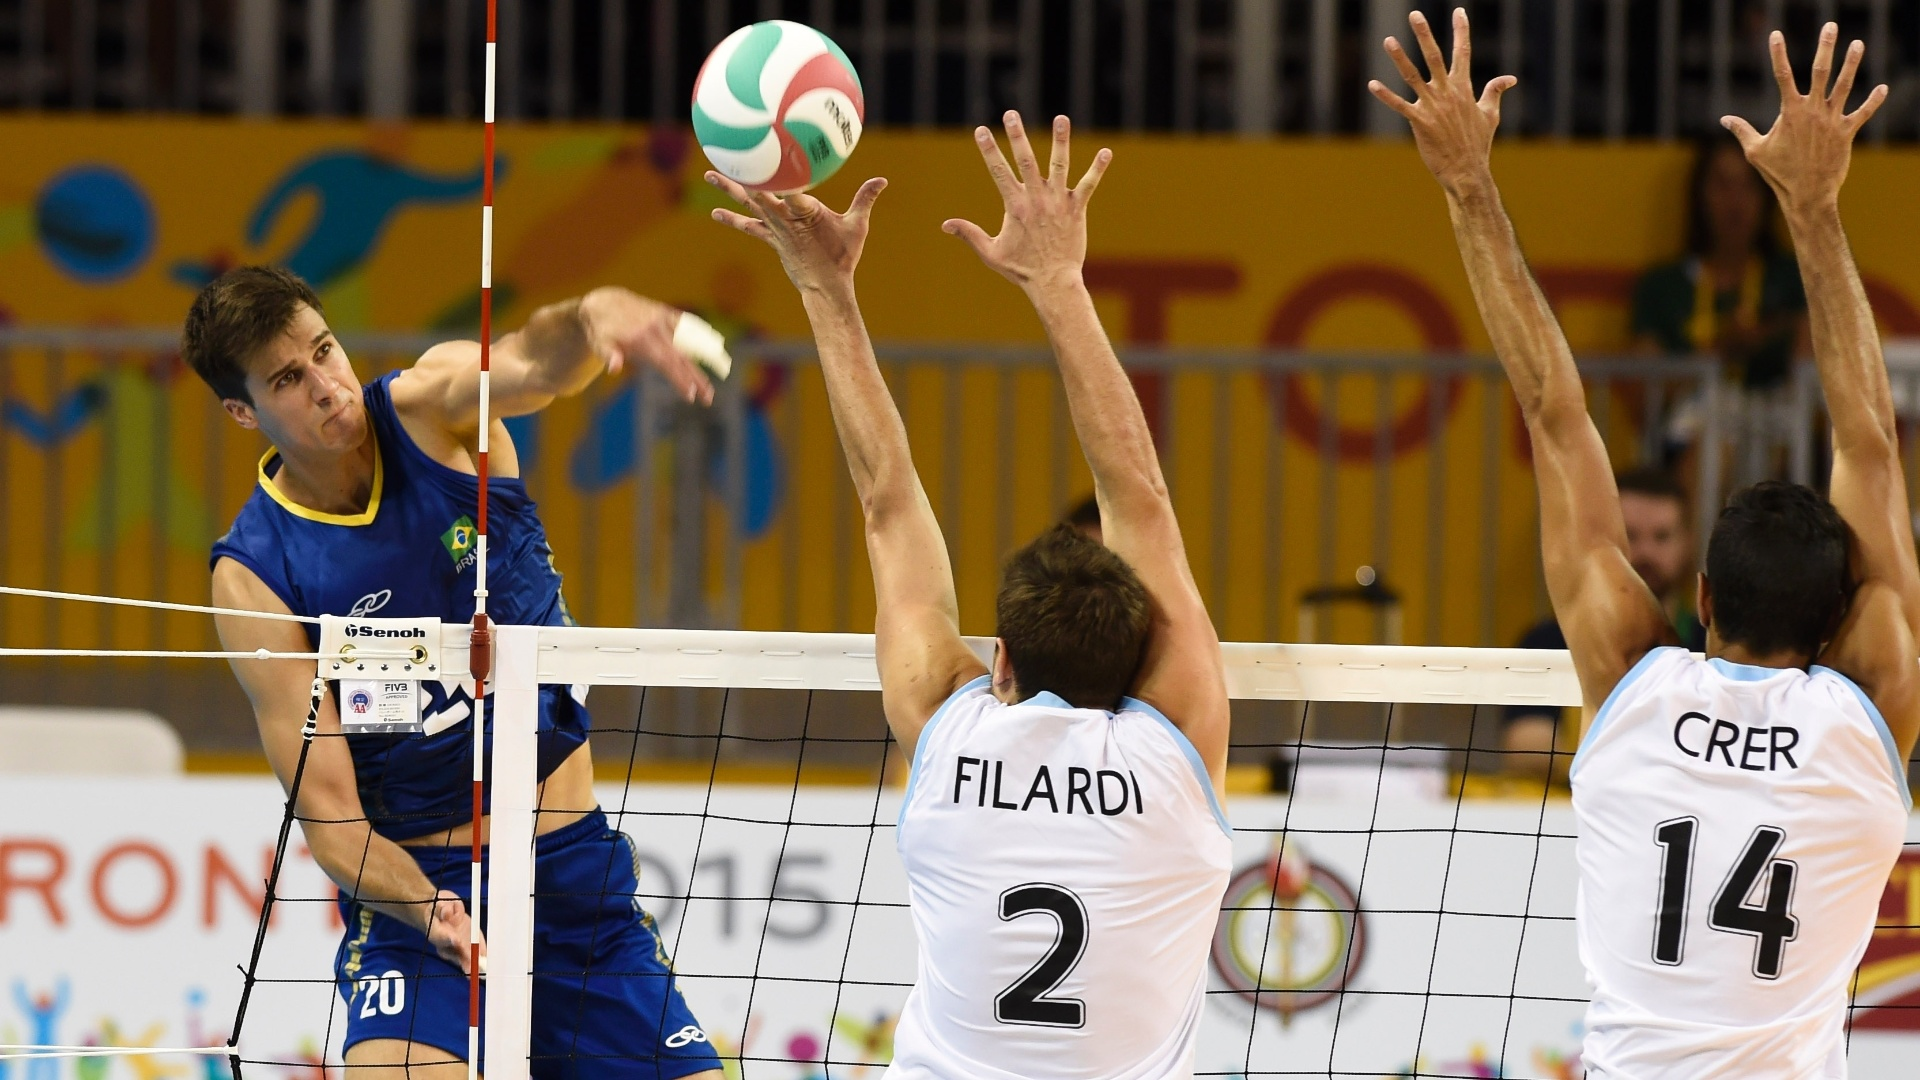 Brasil enfrenta a Argentina pelo vôlei masculino